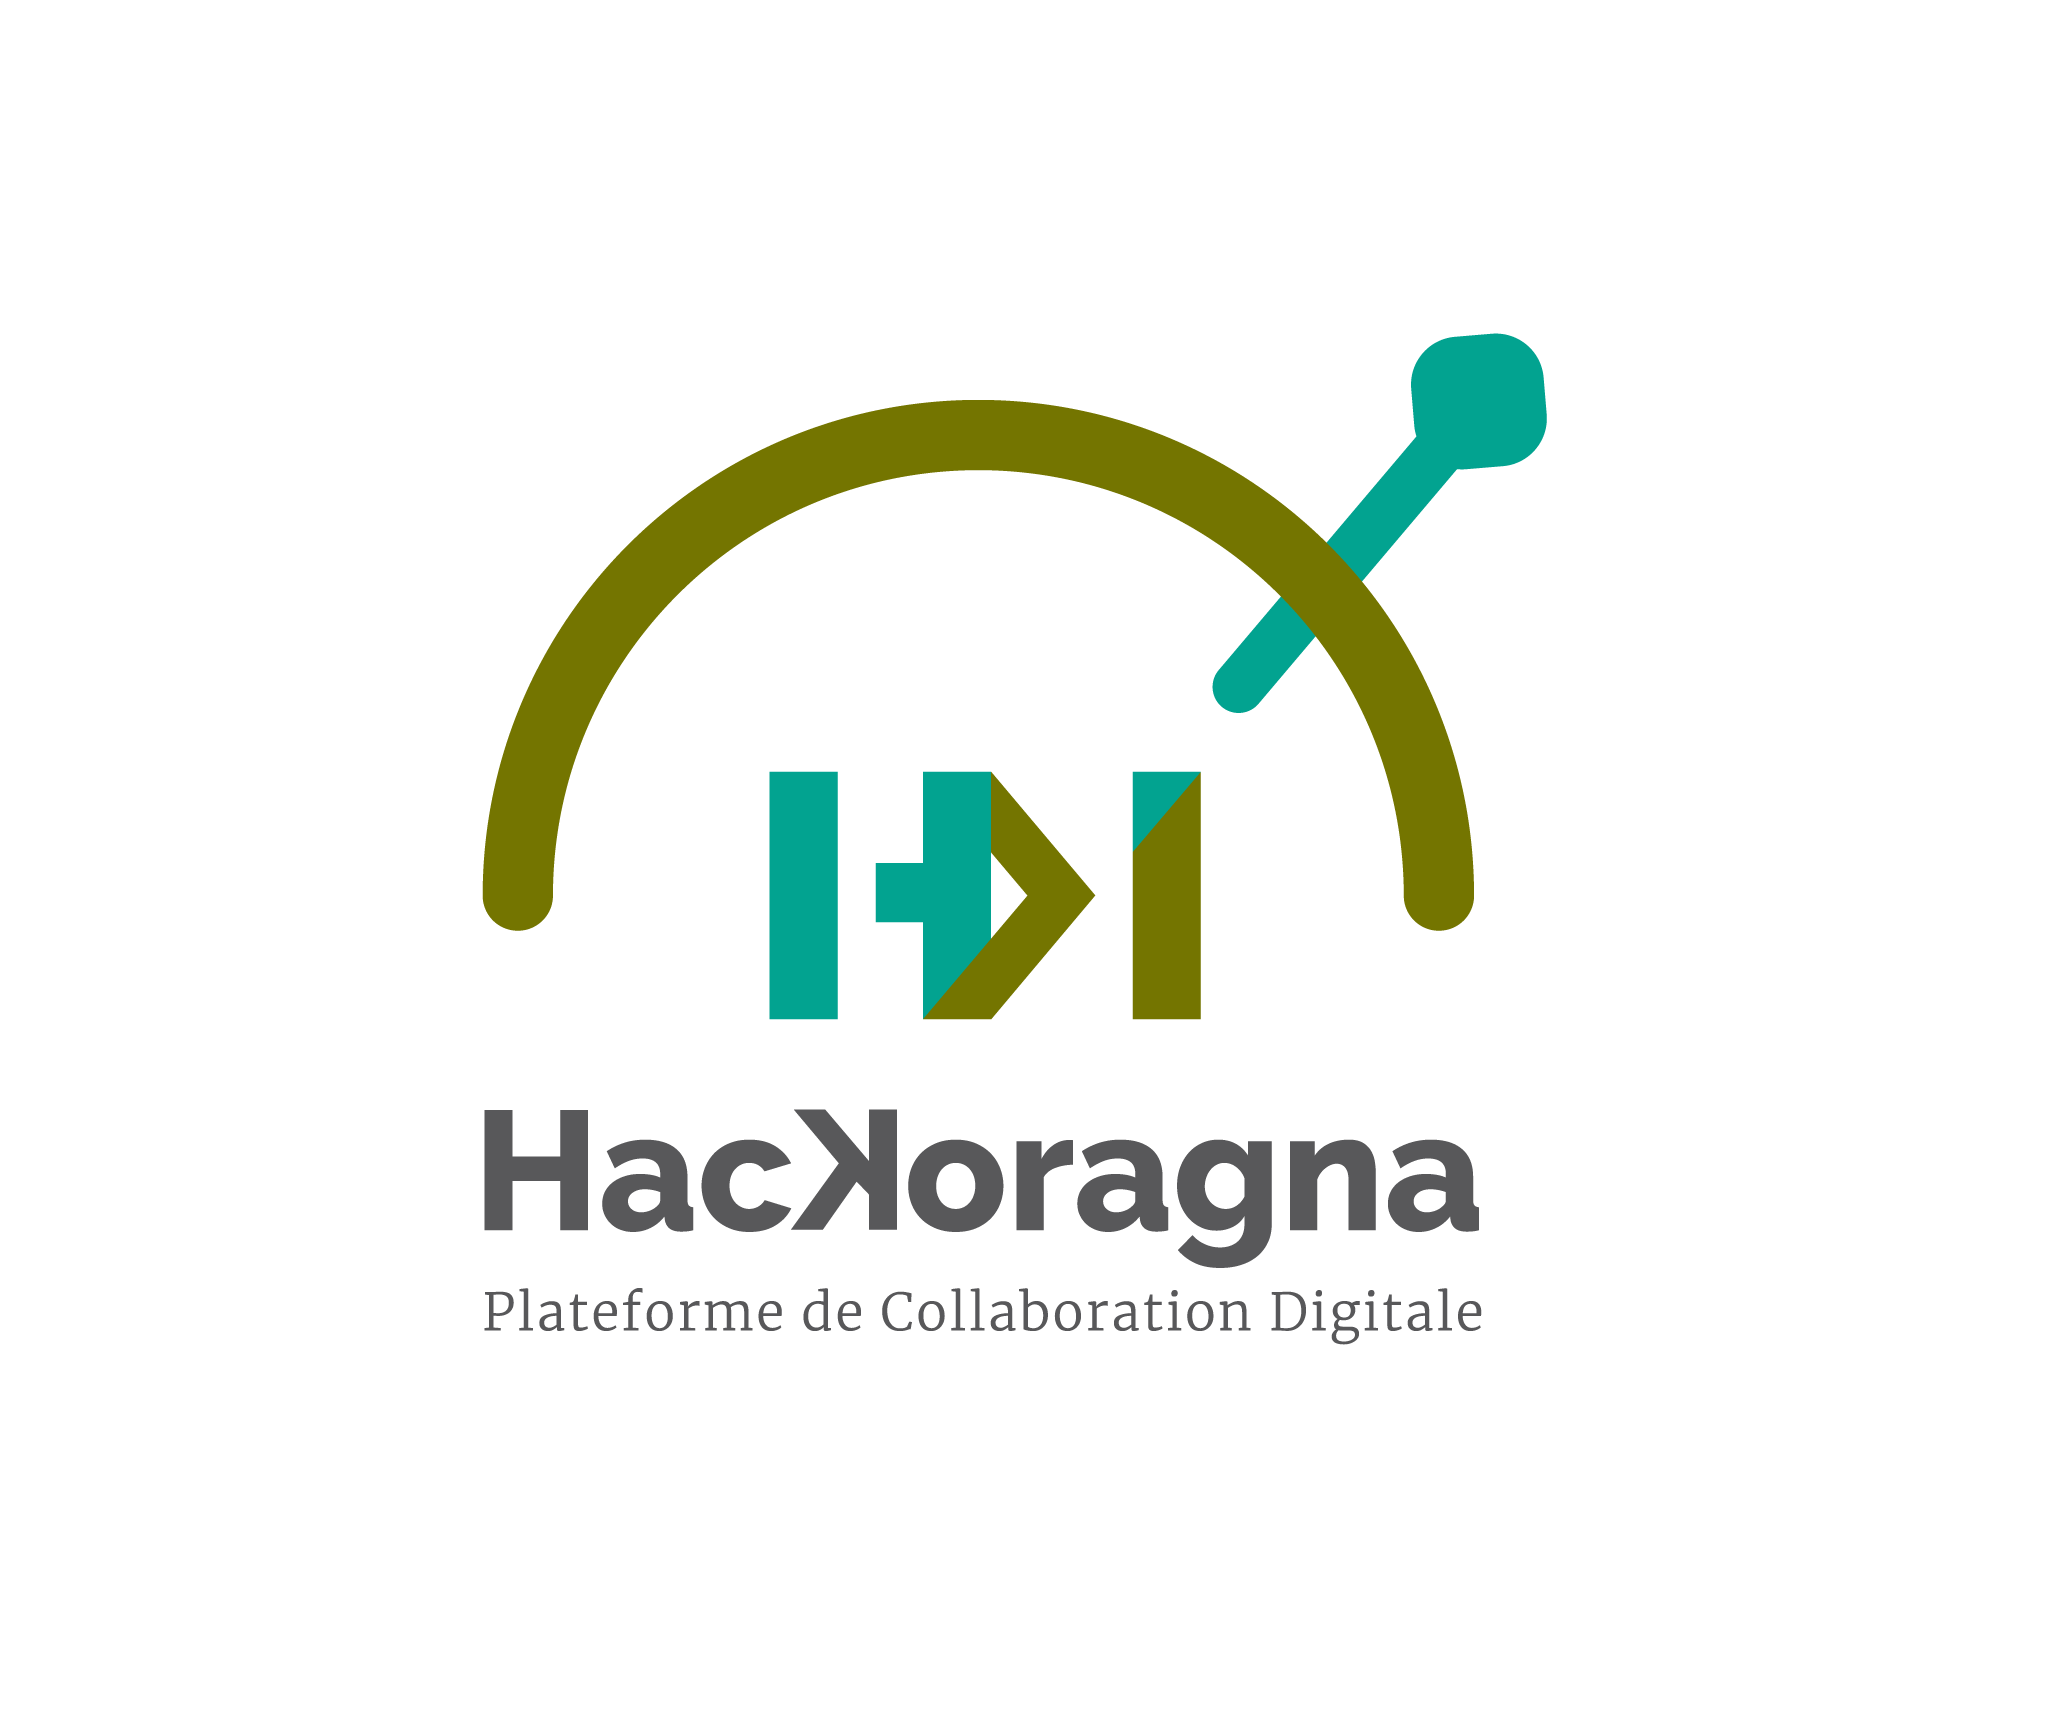 Hackoragna